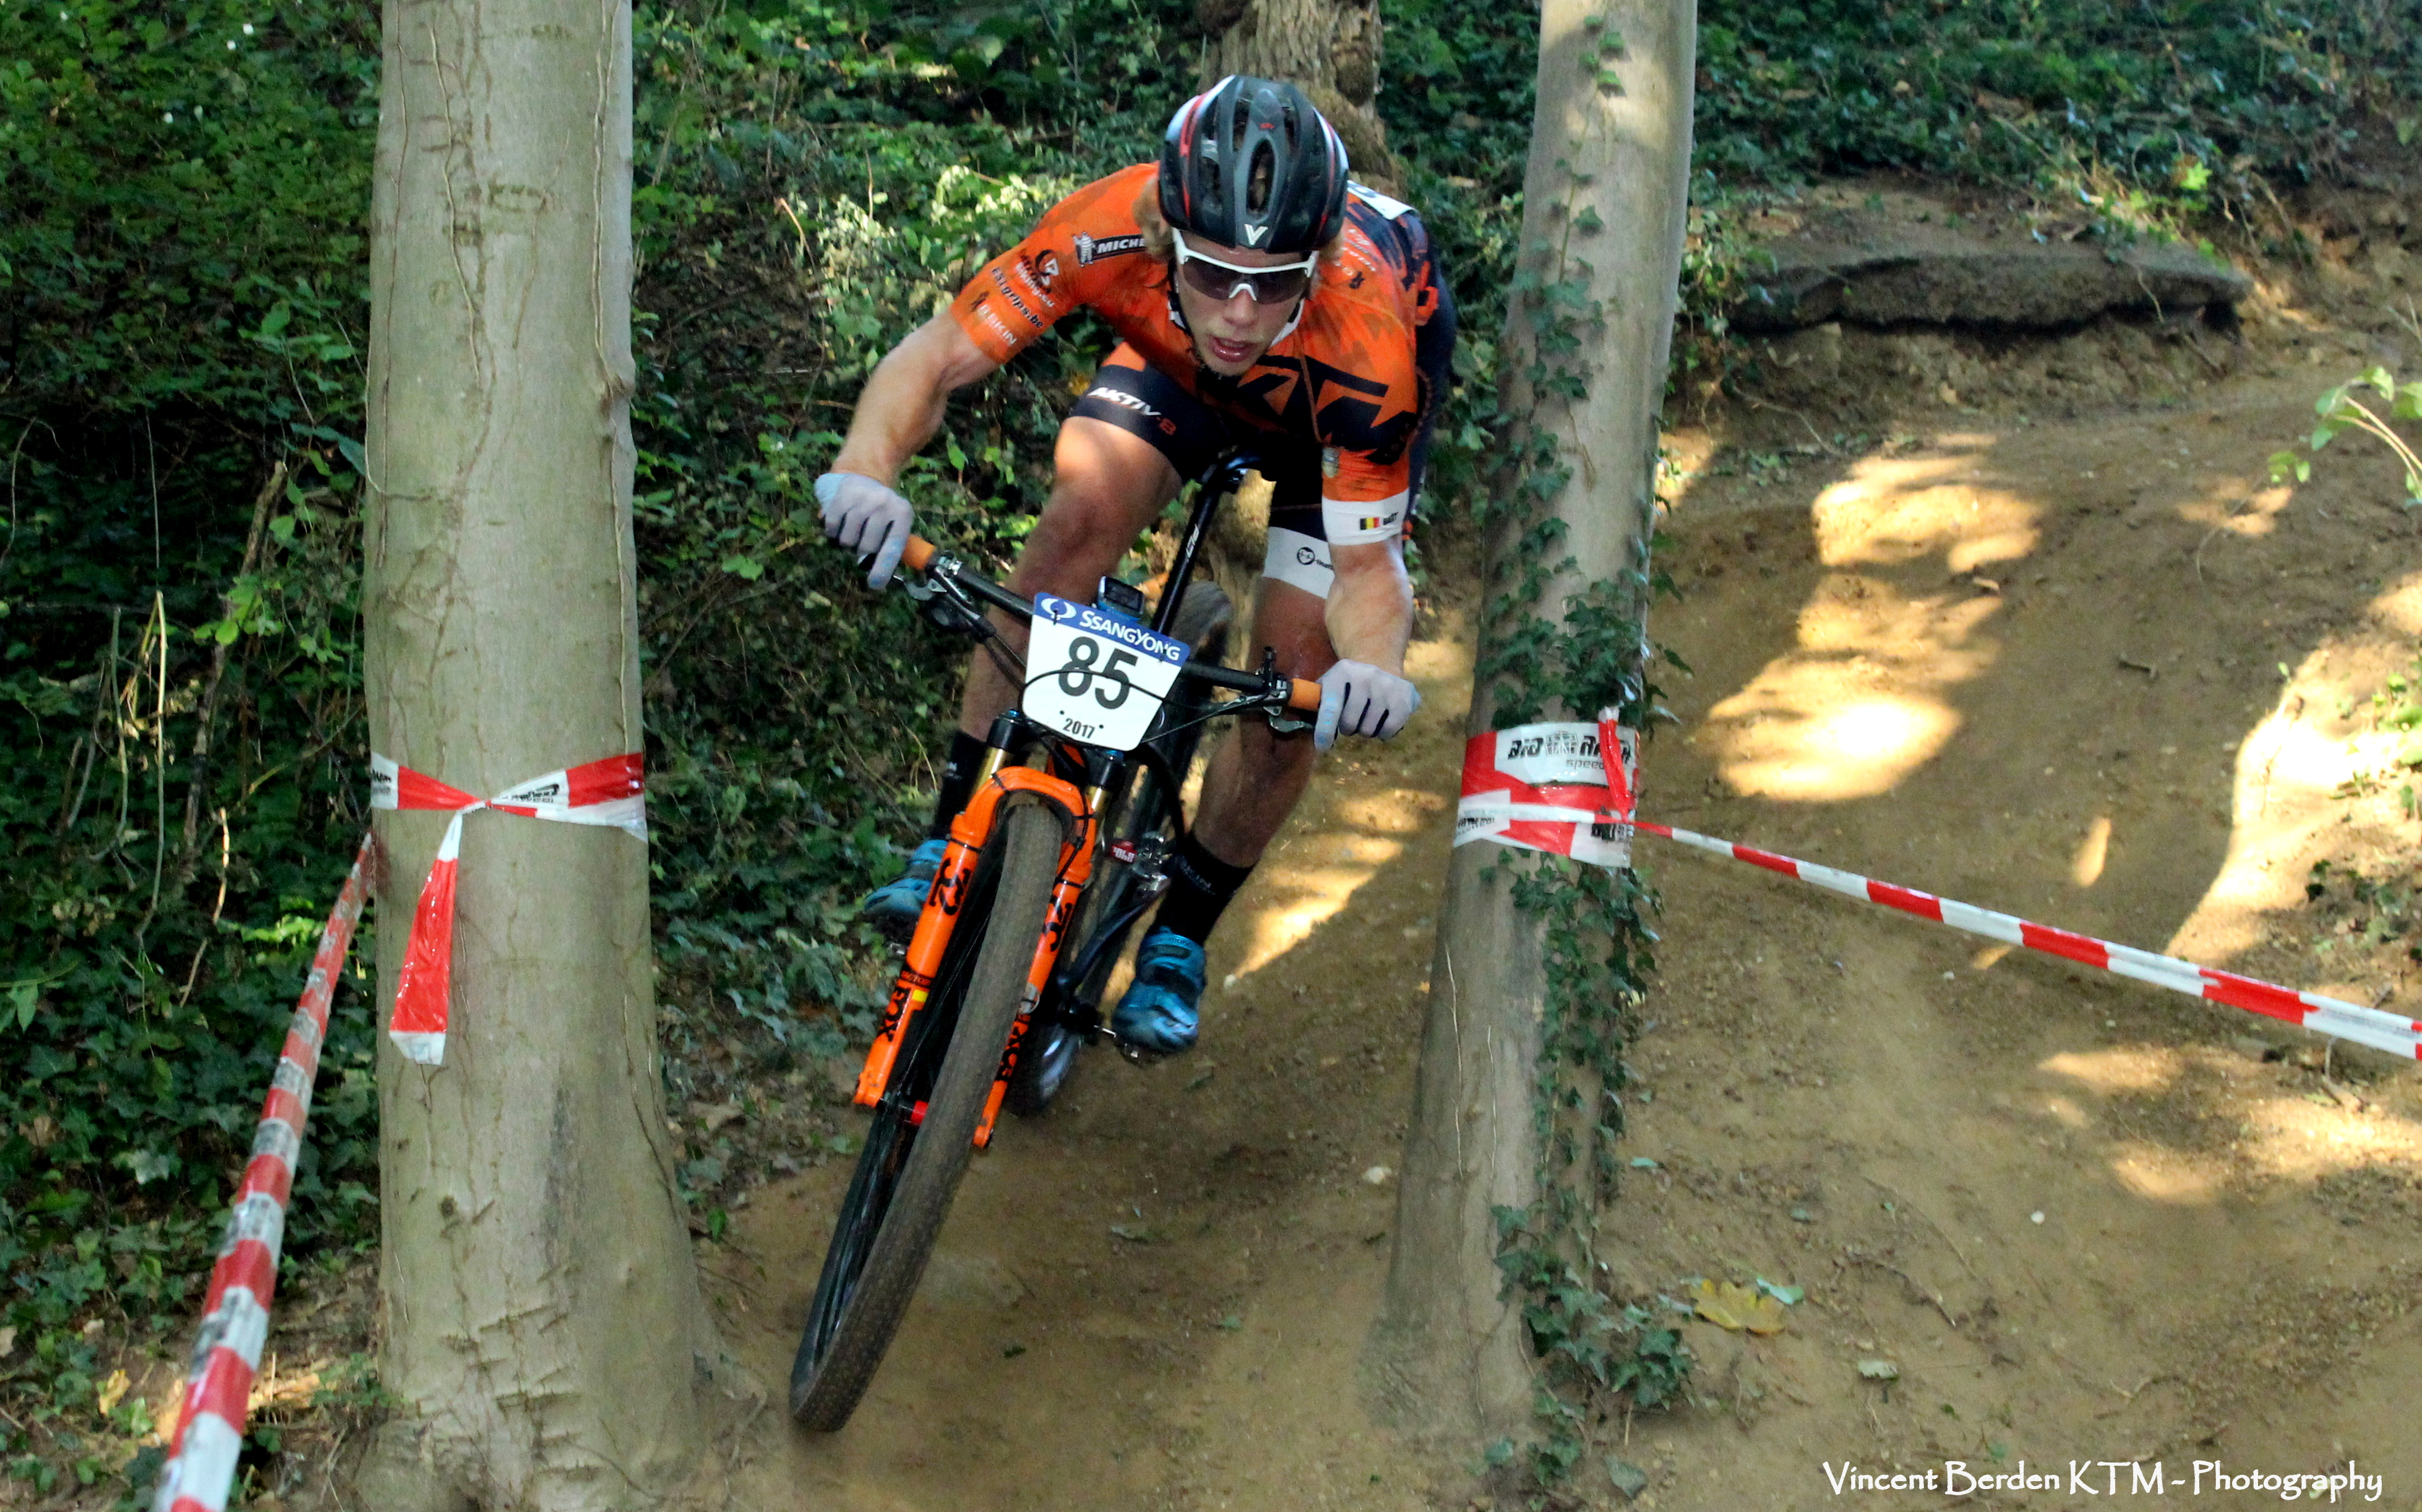 KTM Bikevision bikers reden finale Beneluxcup in Sittard